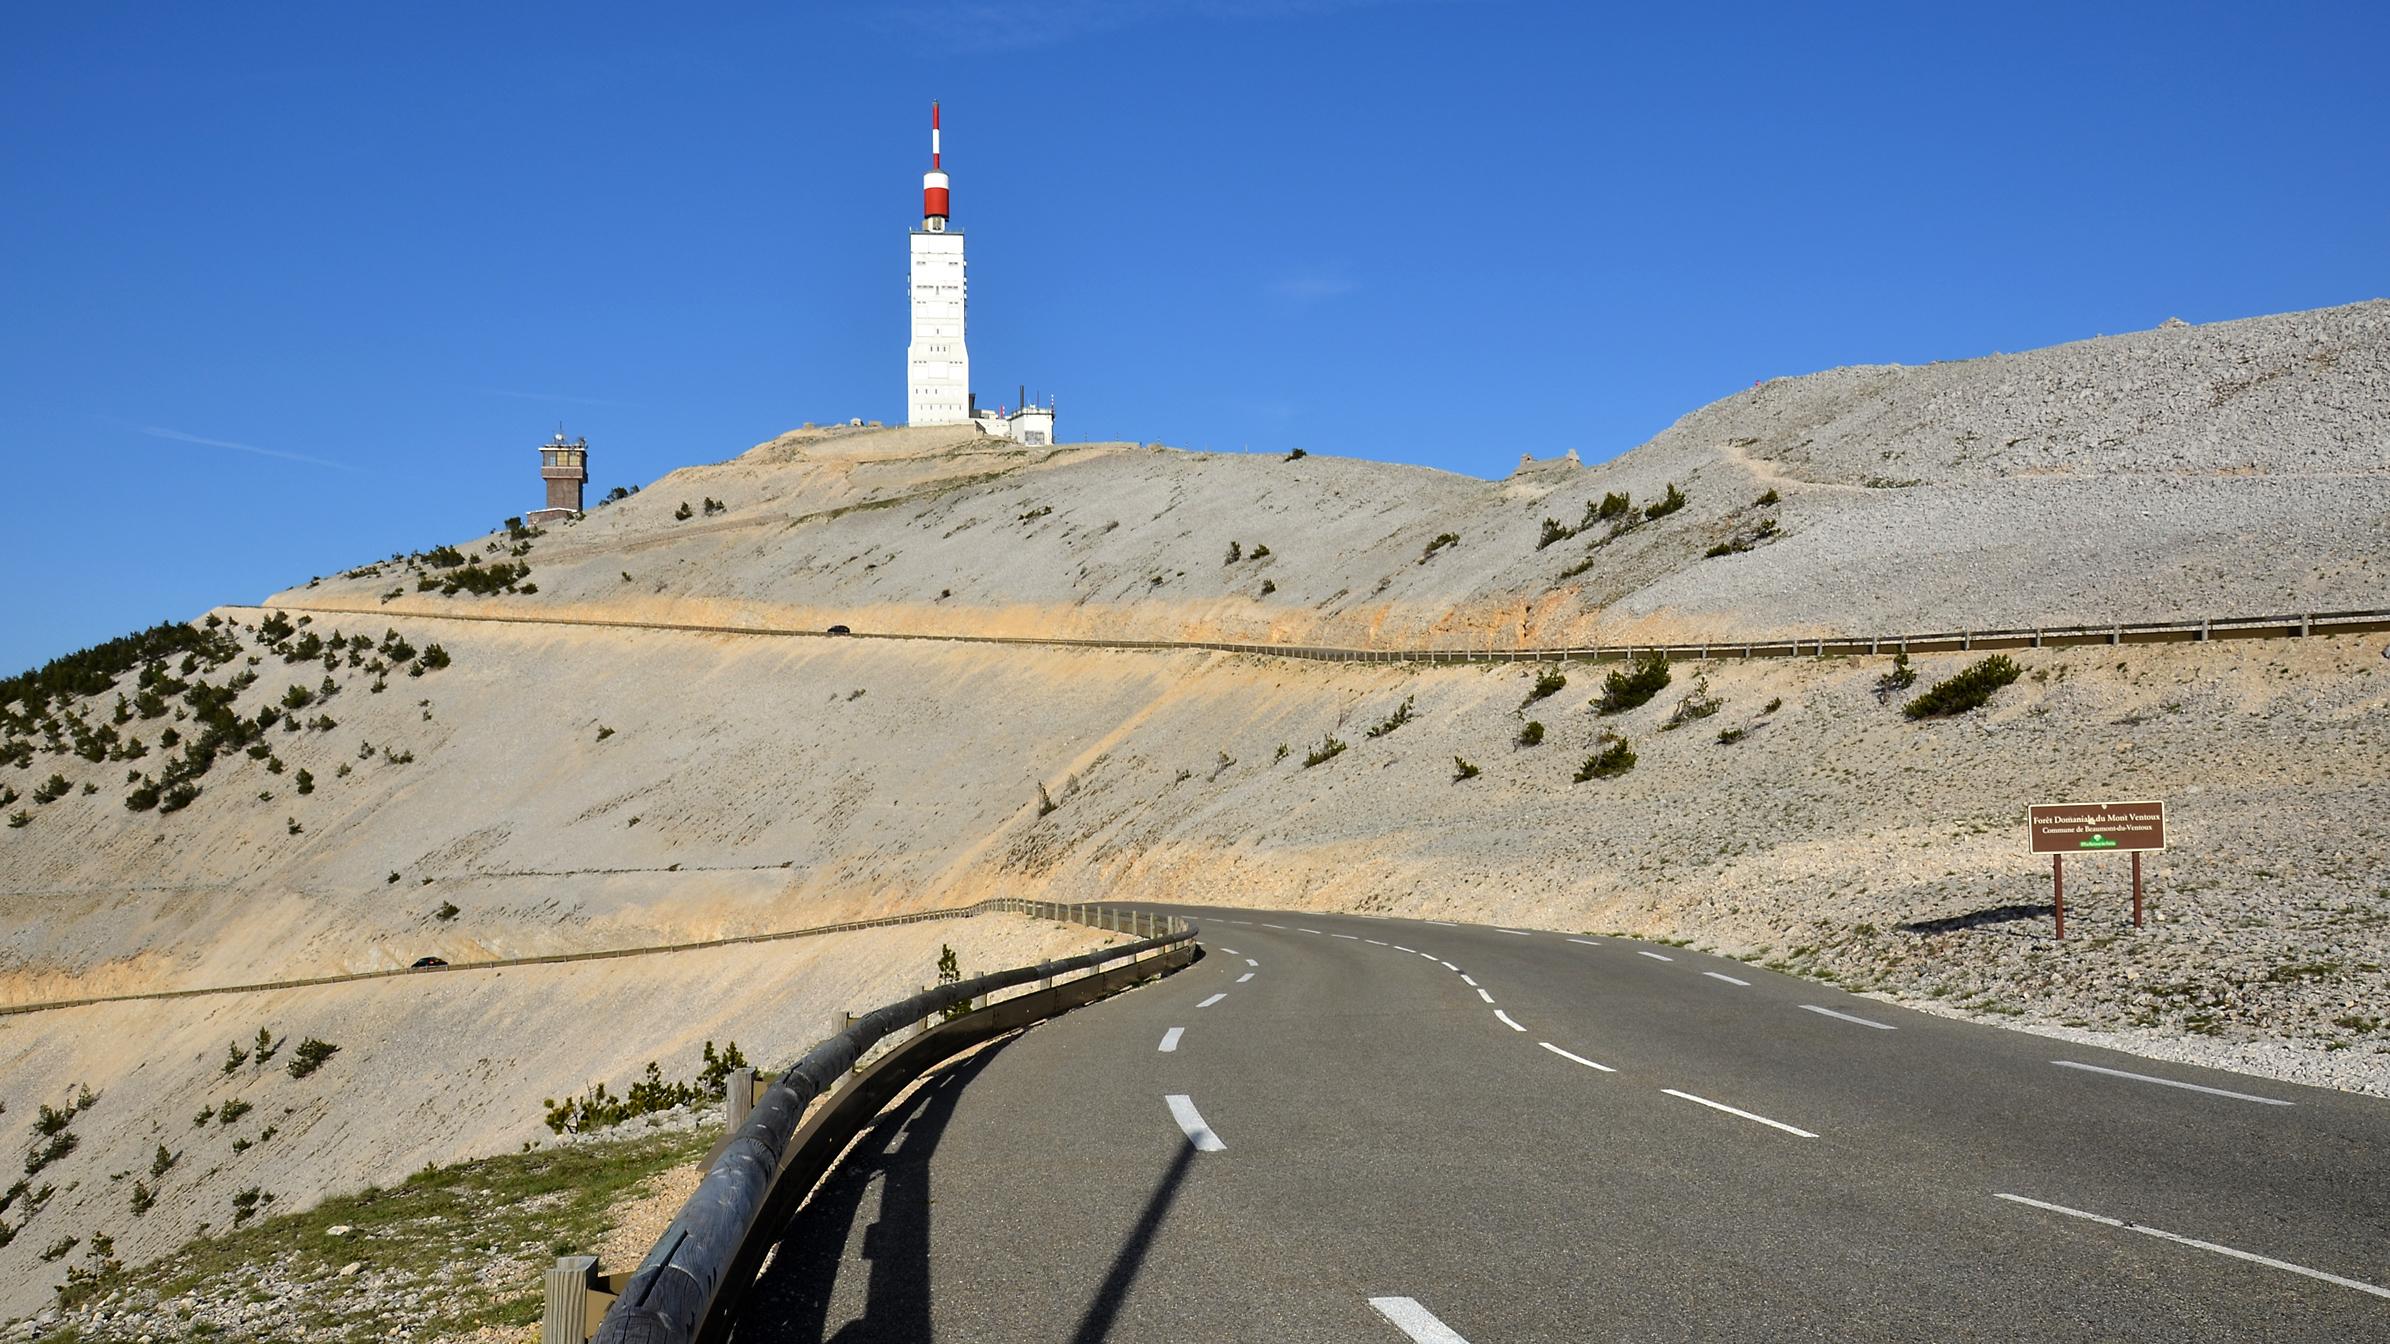 https://upload.wikimedia.org/wikipedia/commons/3/32/140608_Mont-Ventoux-04.jpg